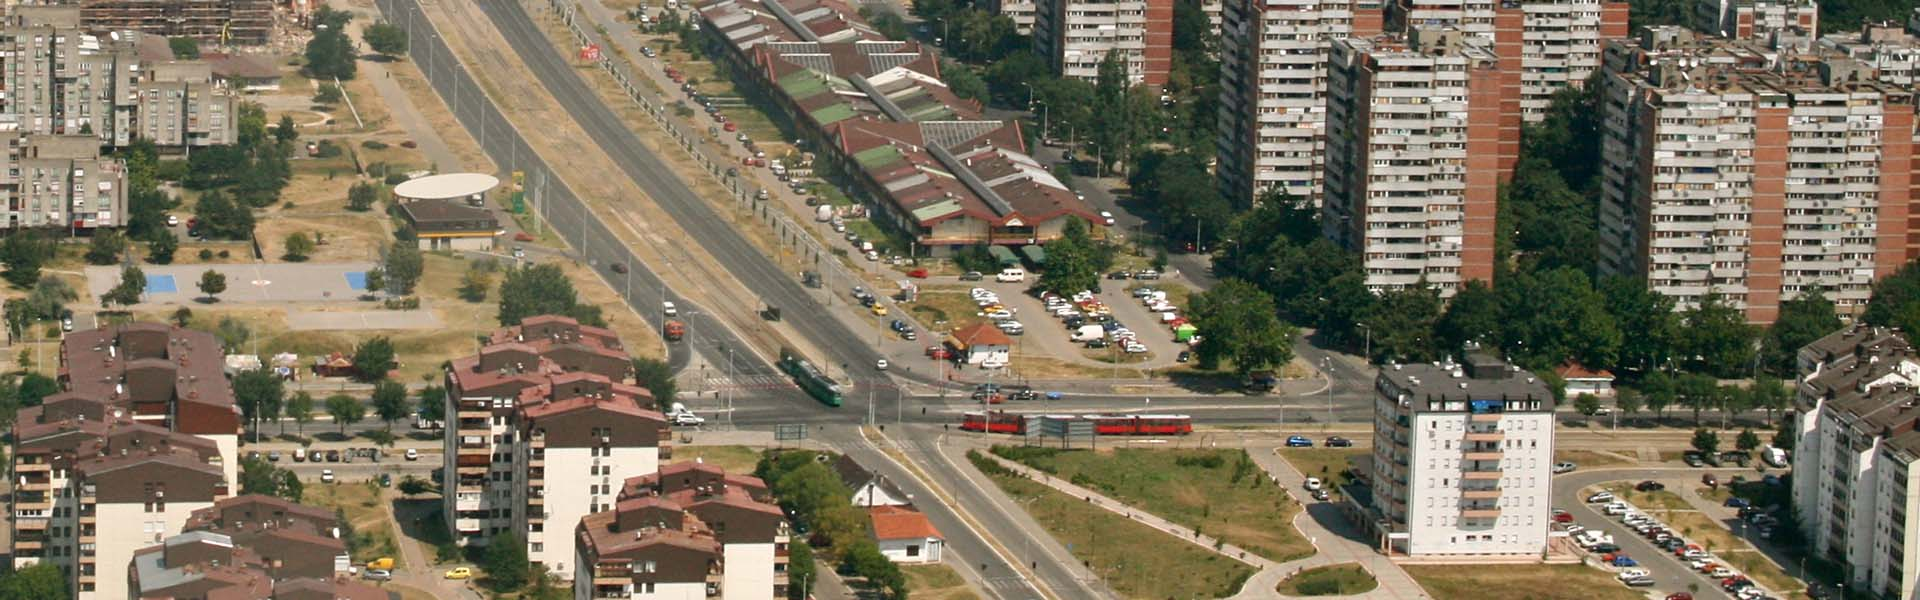 Dostava hrane Enjub (blok 45) | Beograd